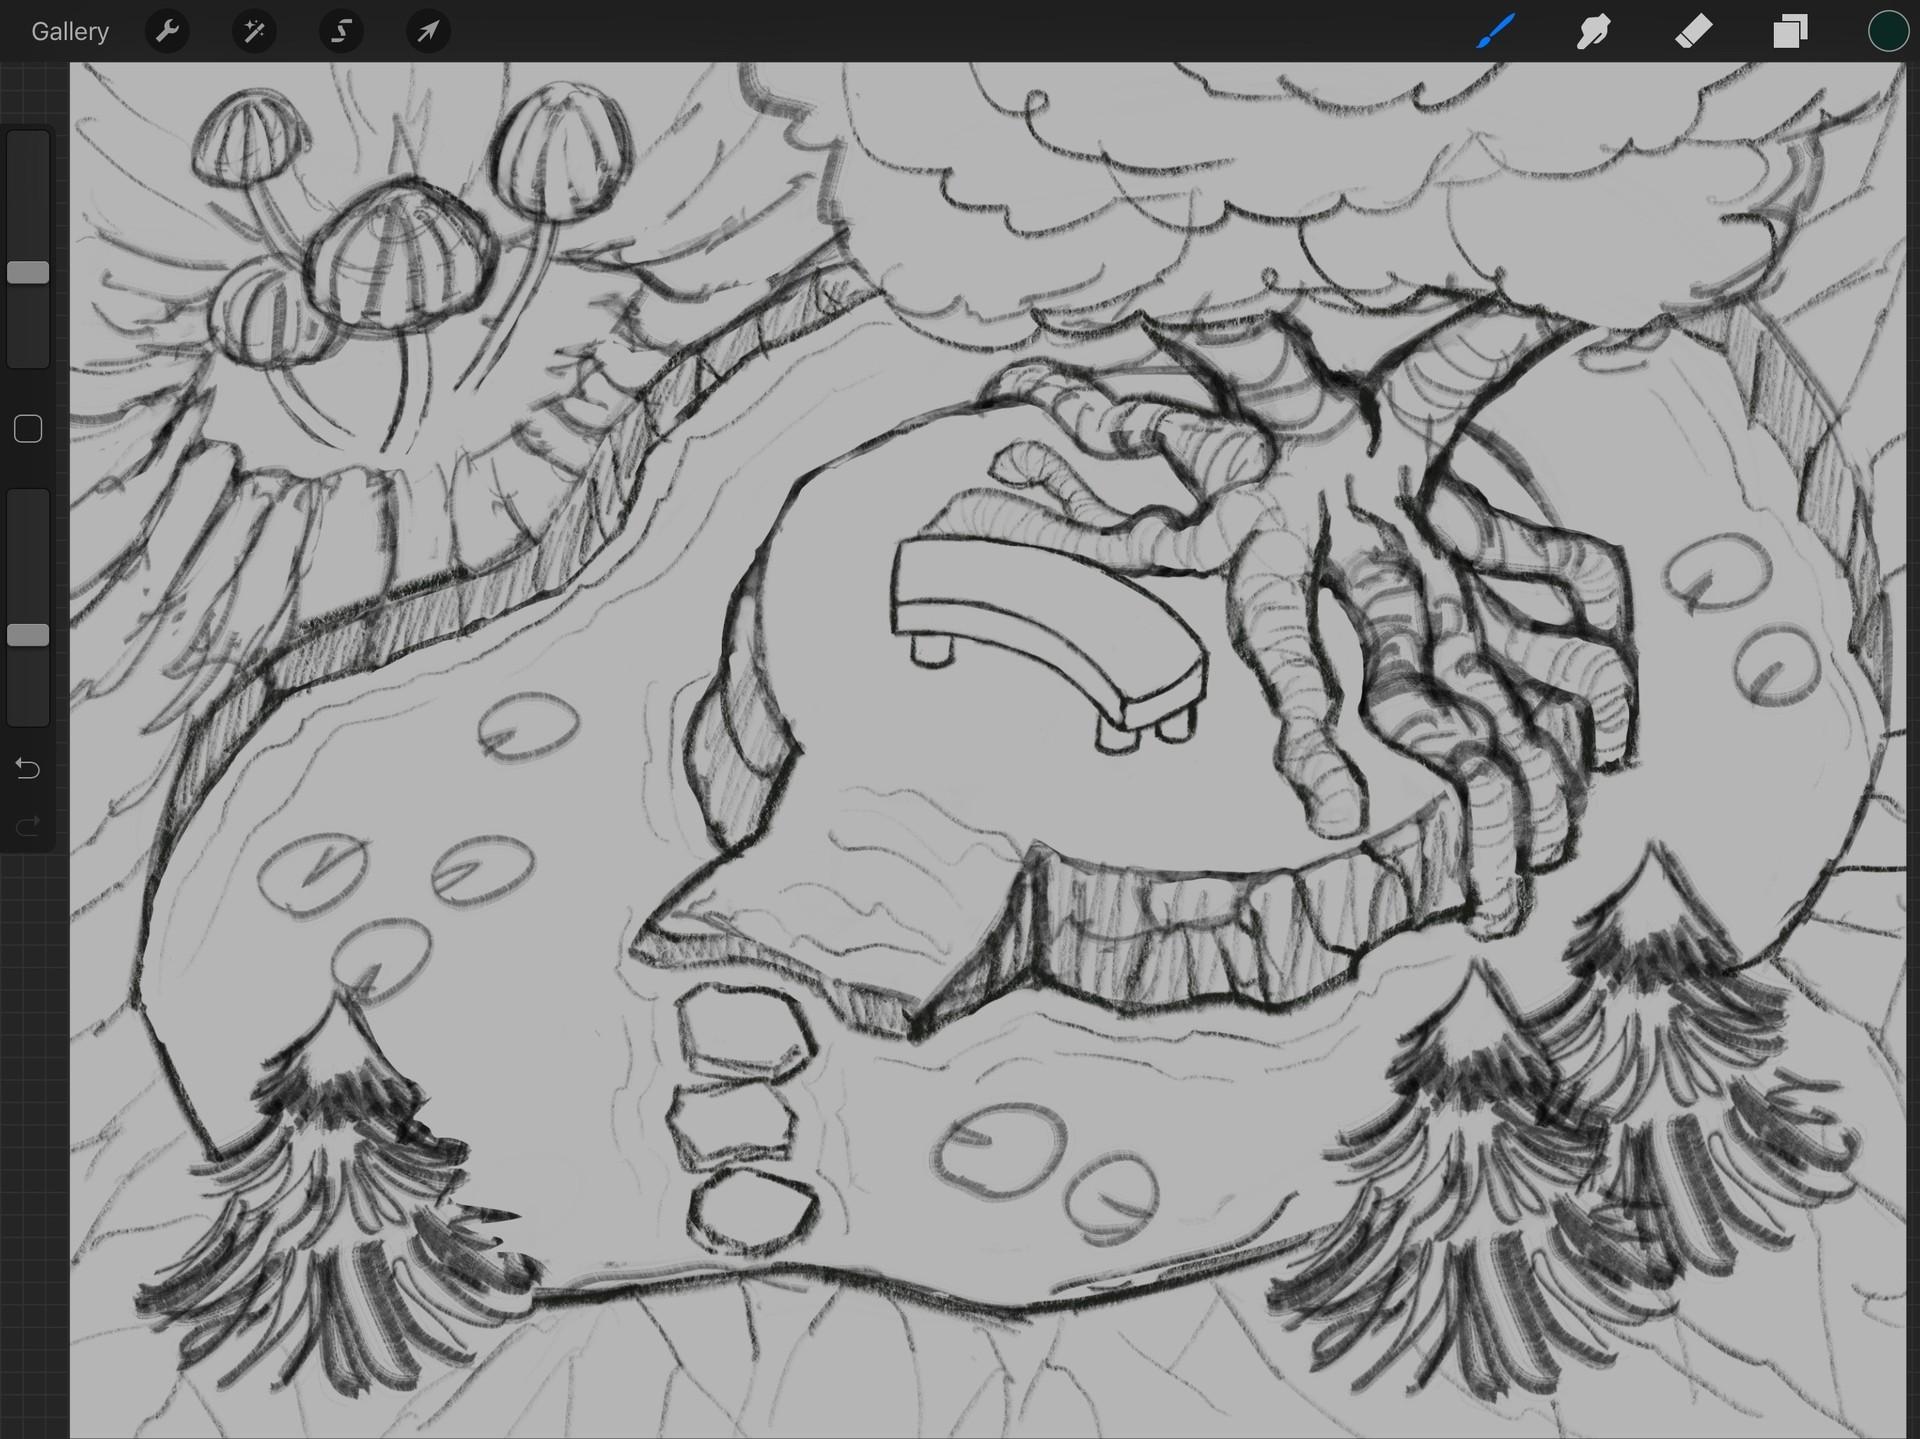 Process Step 1 - Sketch